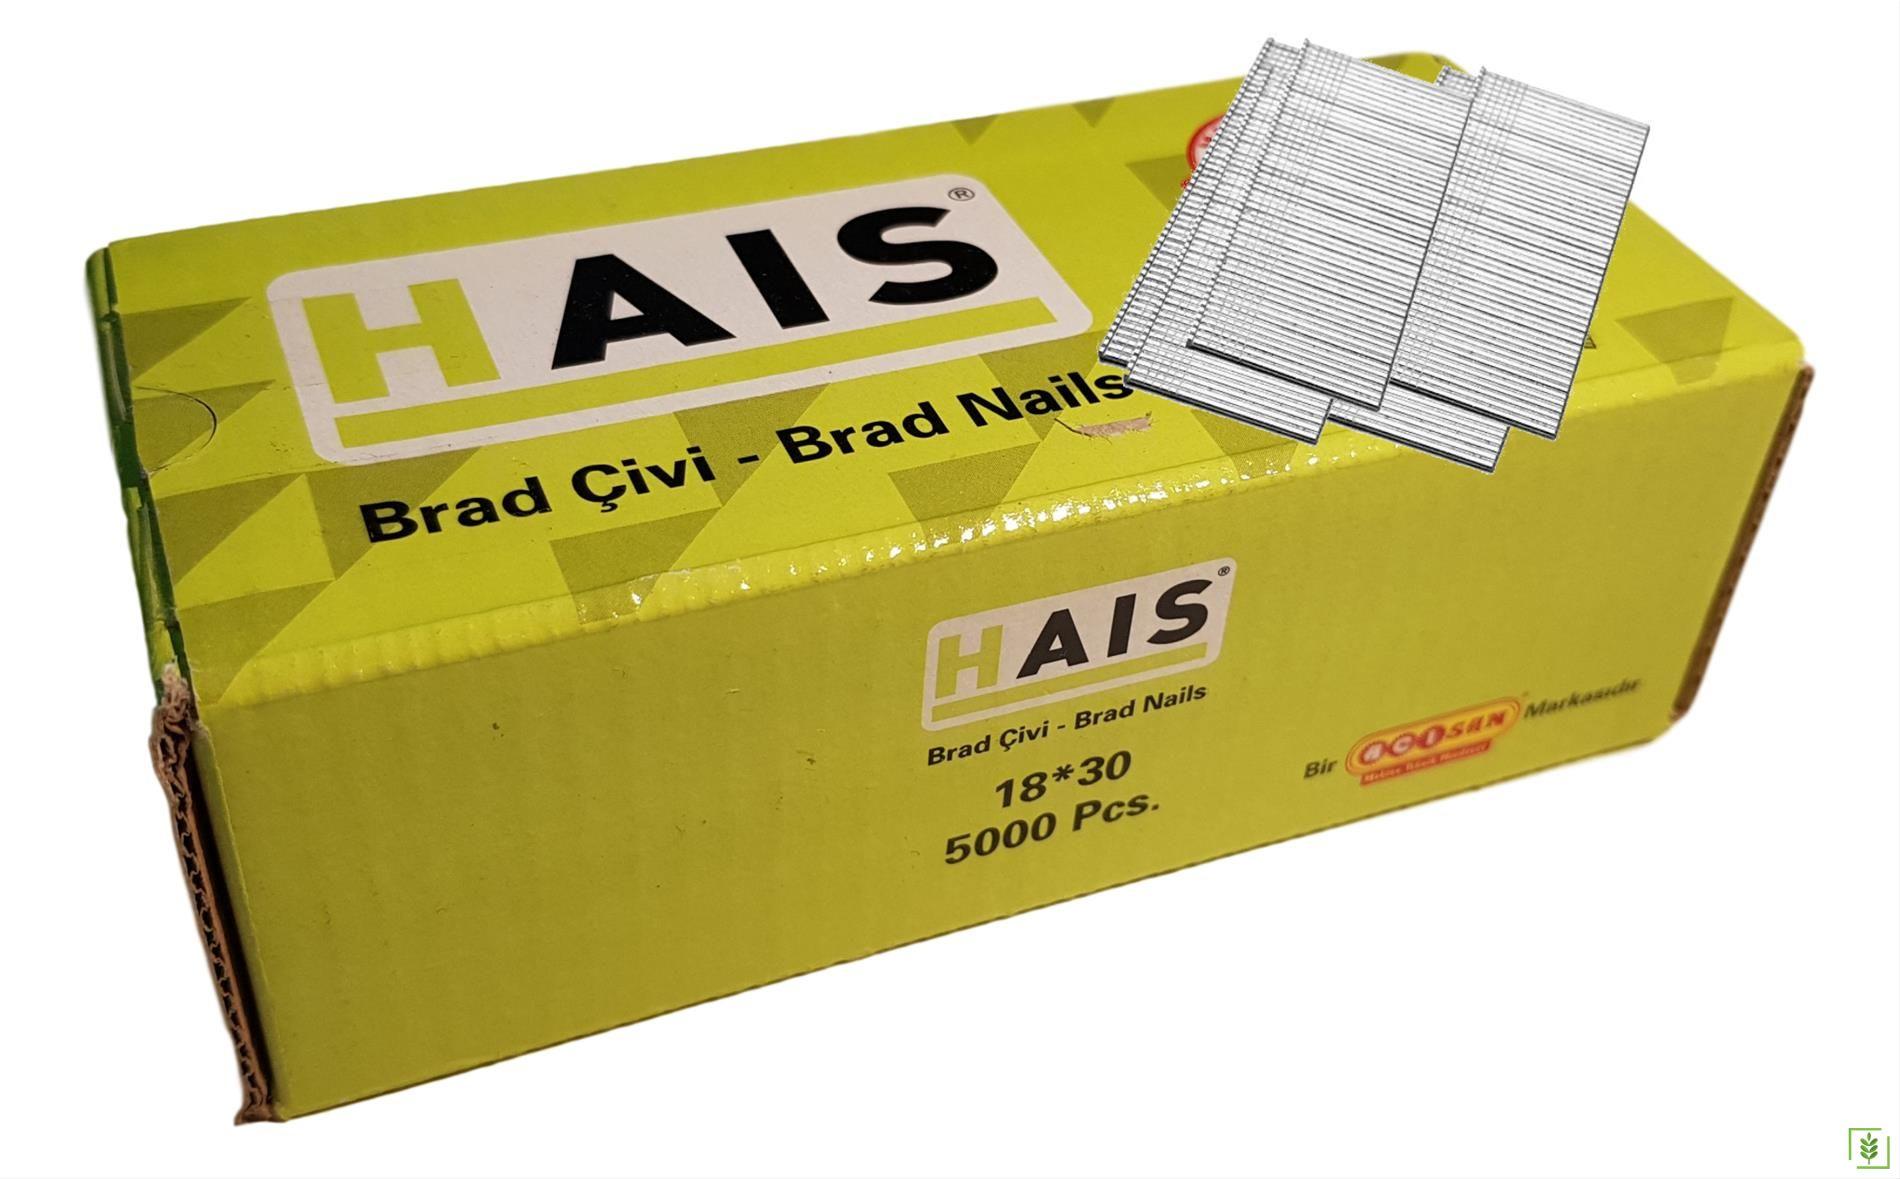 Hais F Serisi 18x30 Brad Çivi 1 Kutu